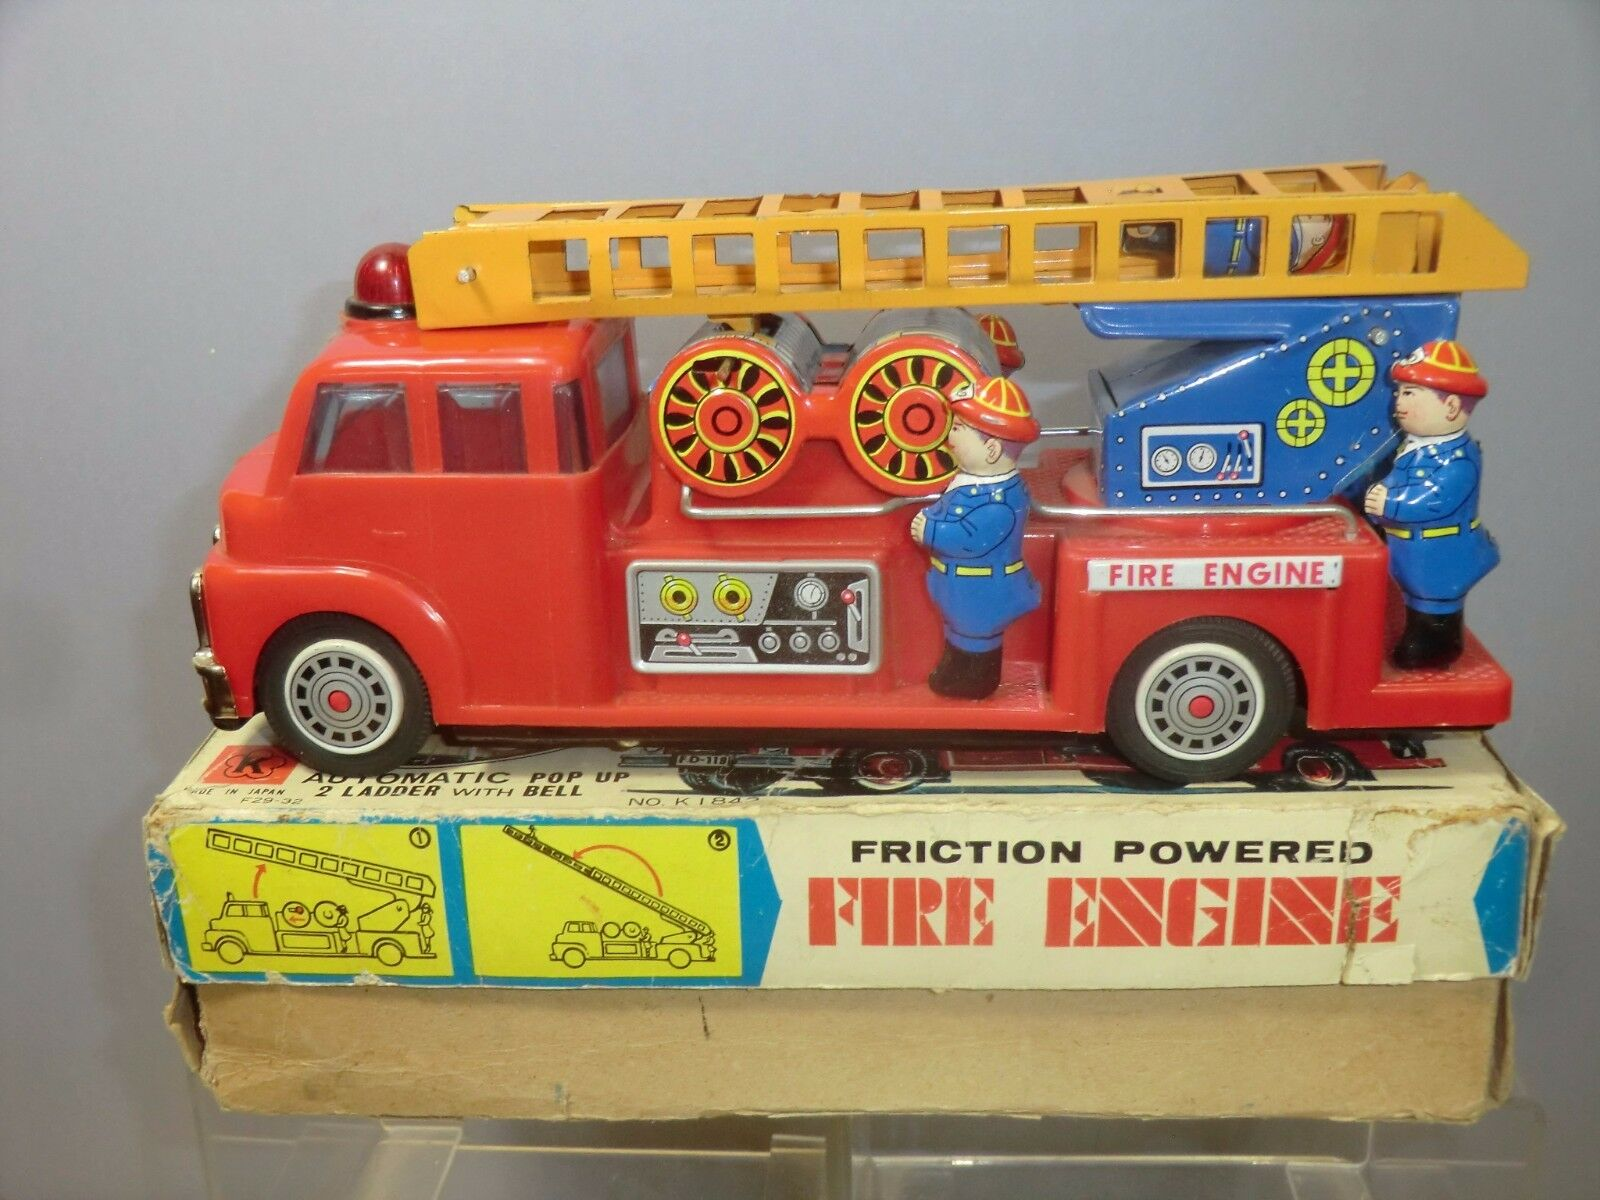 VINTAGE TINPLATE & PLASTIC FRICTION MODEL No.K.1842   F.9 FIRE ENGINE    VN MIB